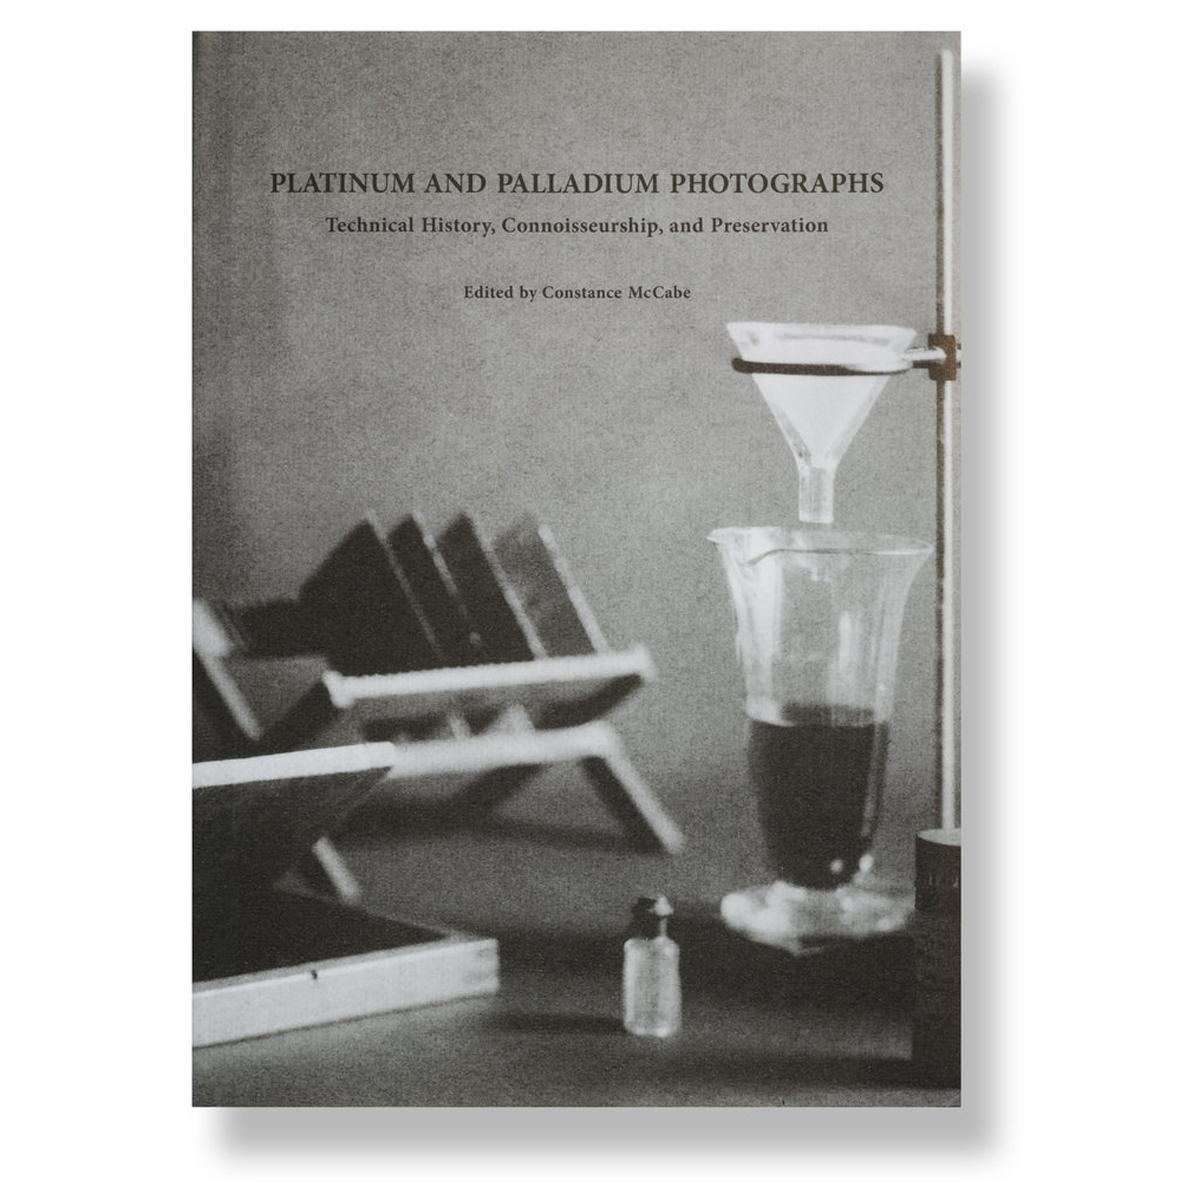 Platinum and Palladium: Technical History, Connoisseurship, and Preservation